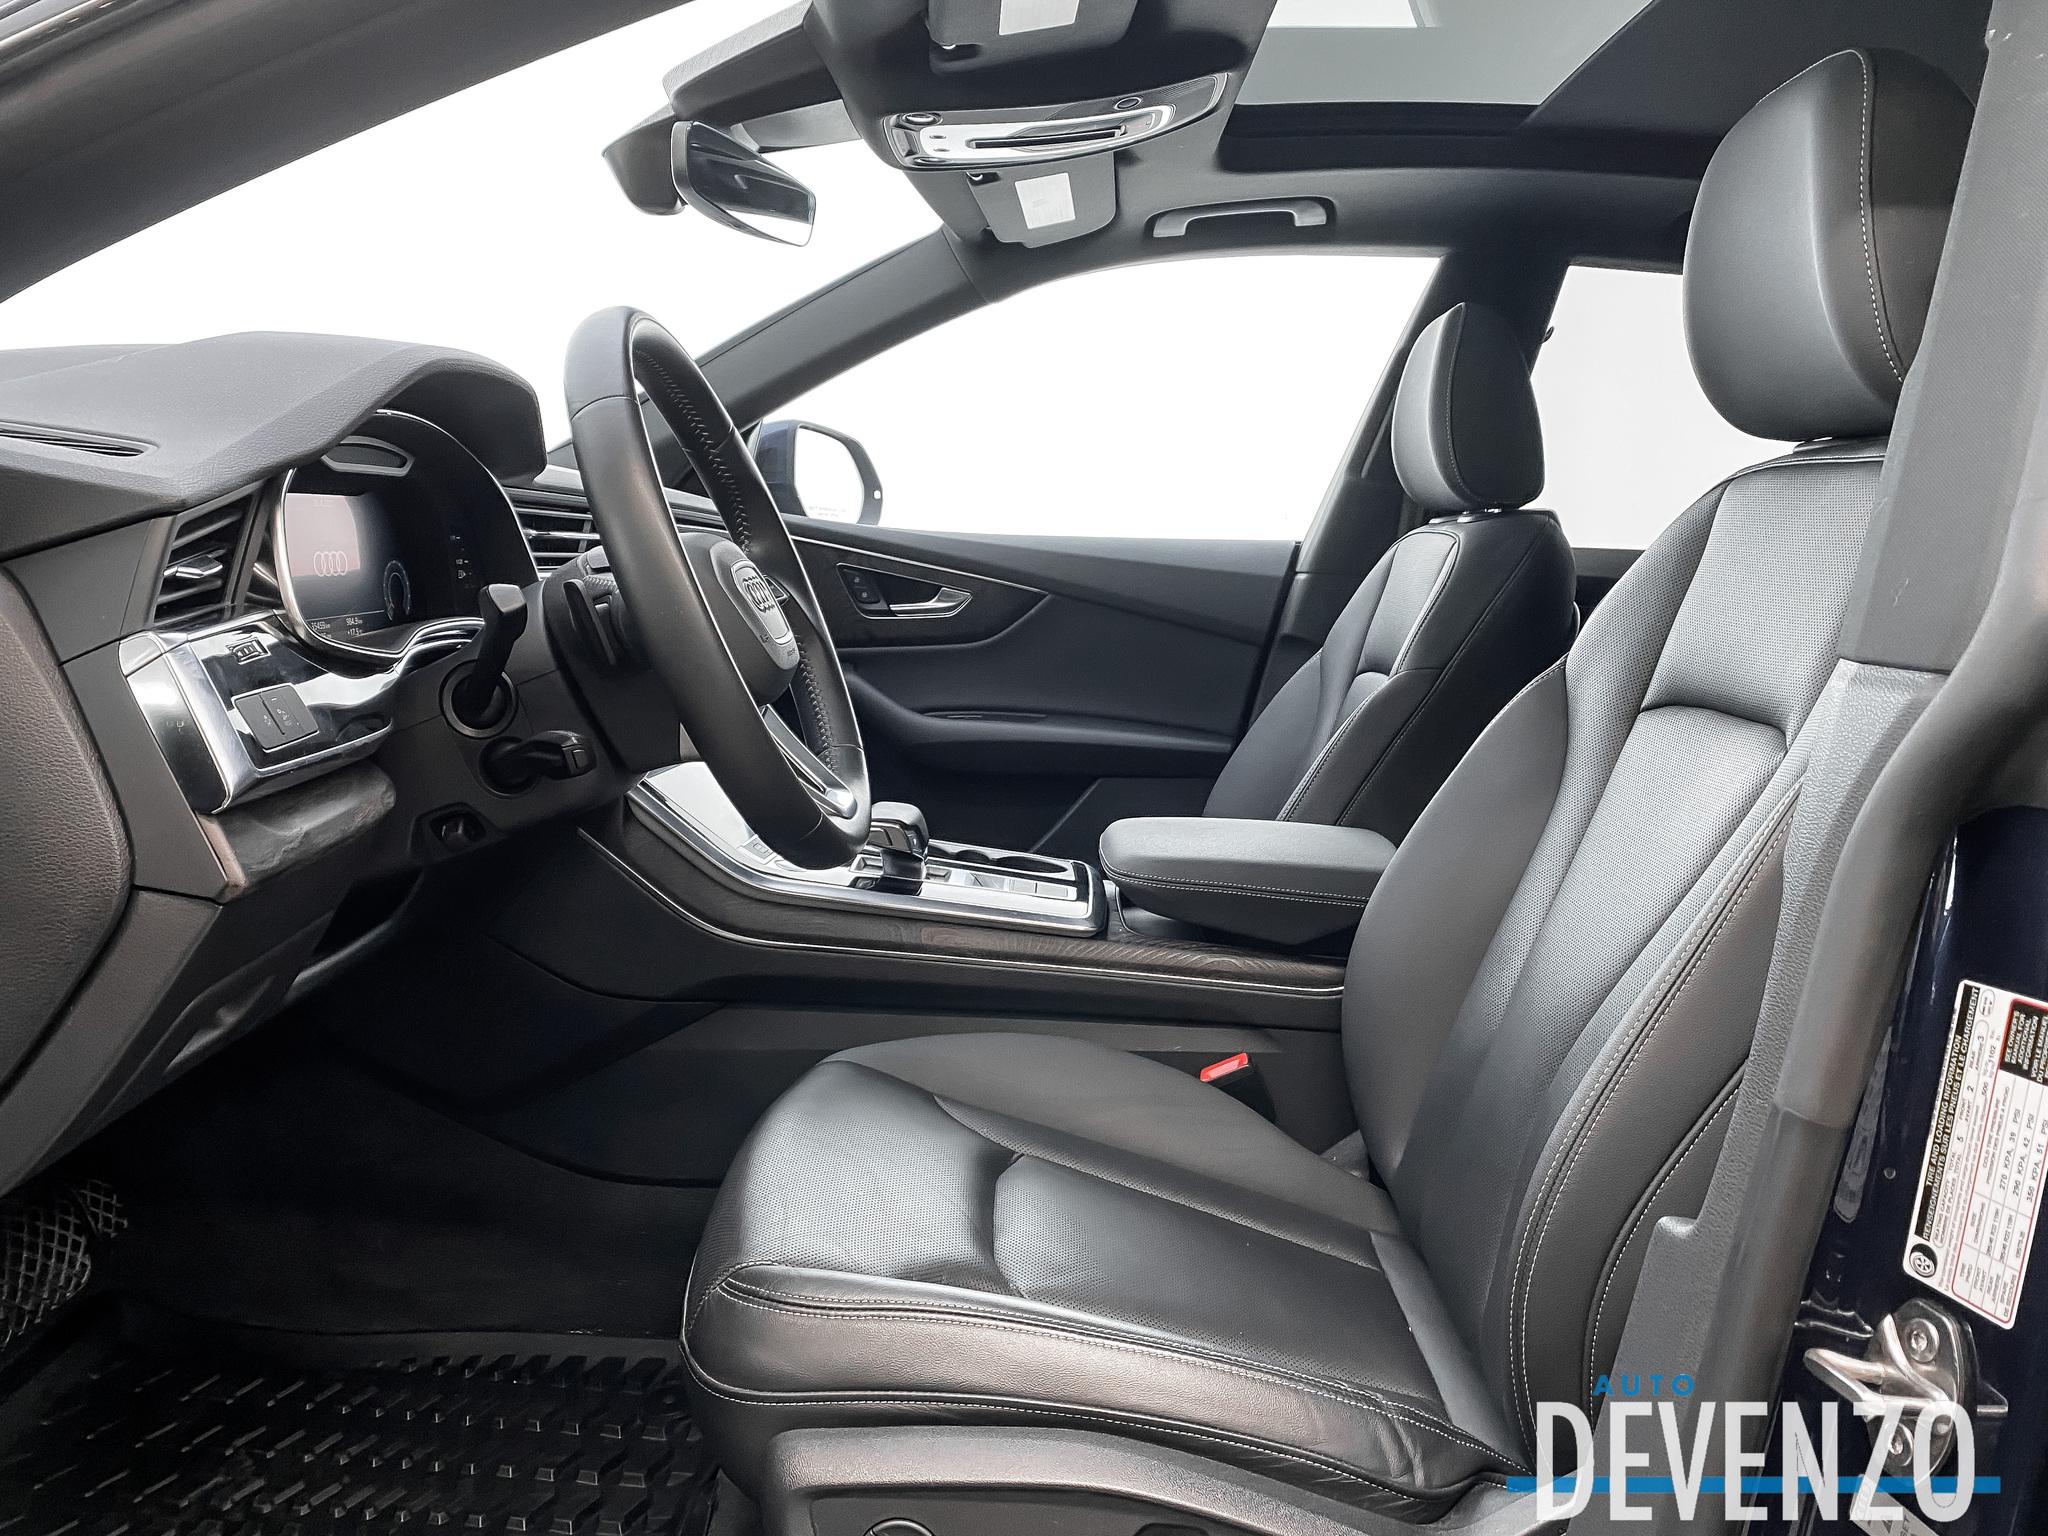 2019 Audi Q8 Progressiv 55 TFSI QUATTRO S-LINE BLACK OPTICS complet